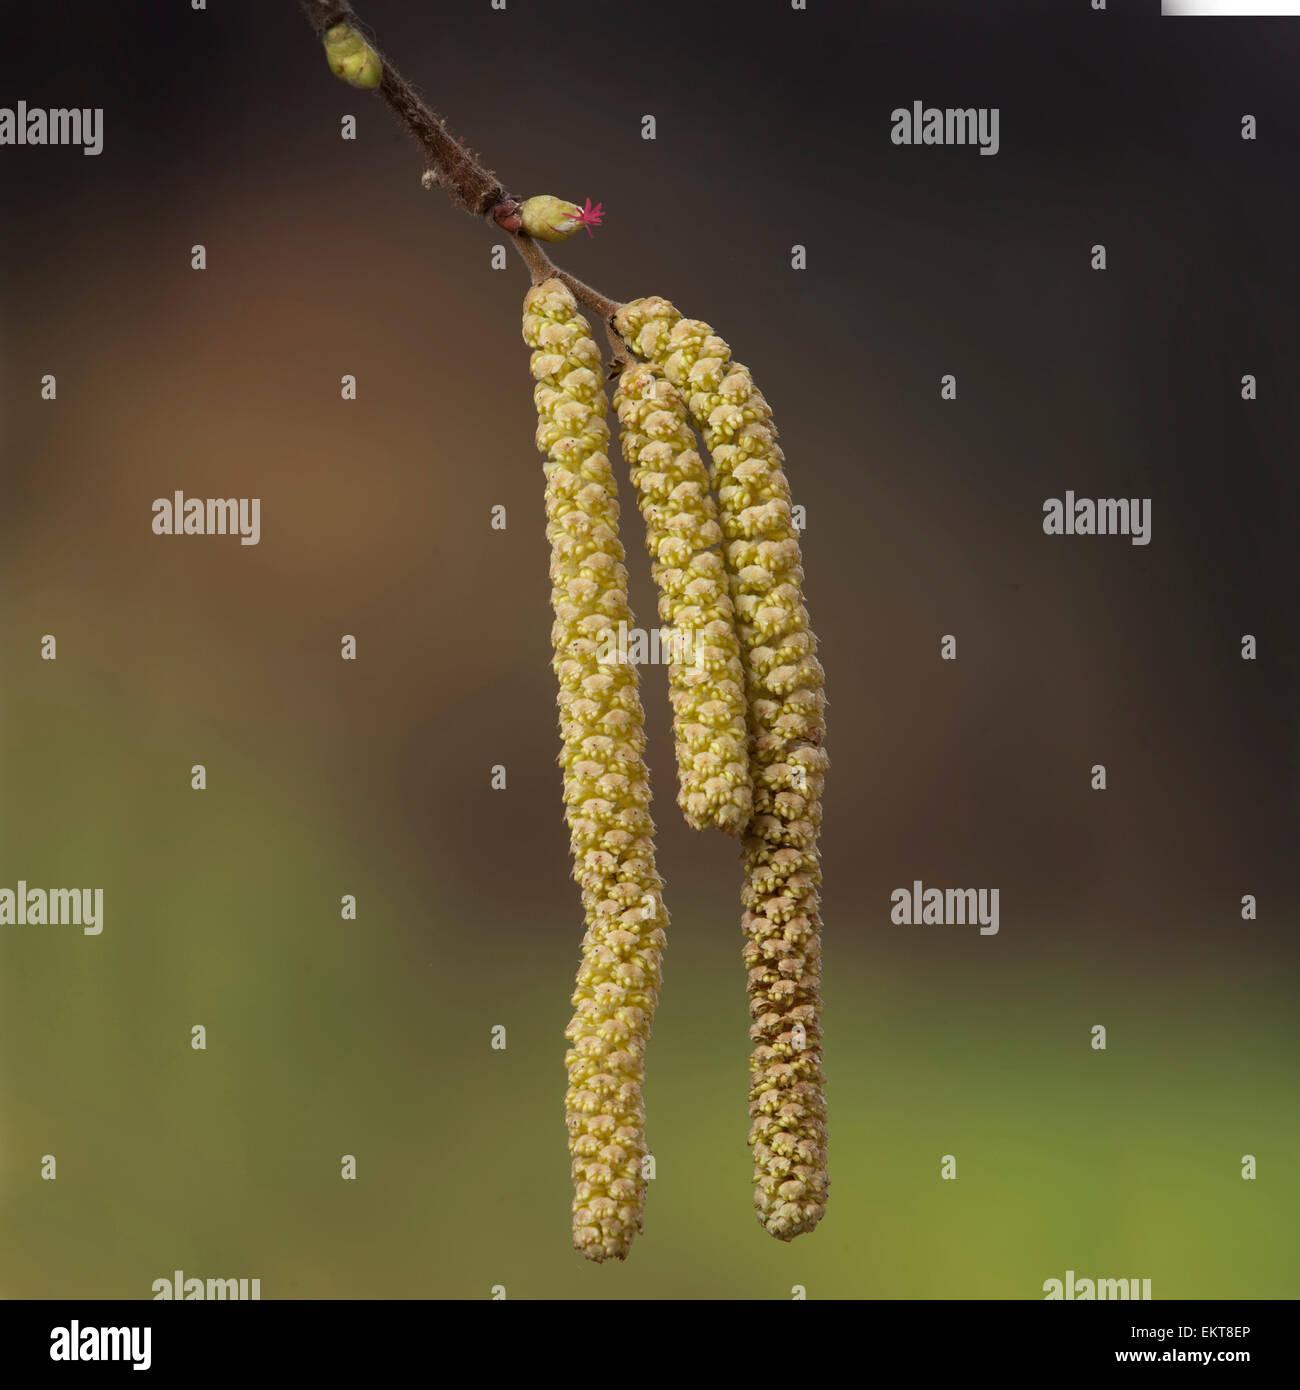 Knospe,Bud,Trieb,Triebspitze,Shoot,Young Shoot,Bluete,Blossom,Bloom,Corylus avellana - Stock Image